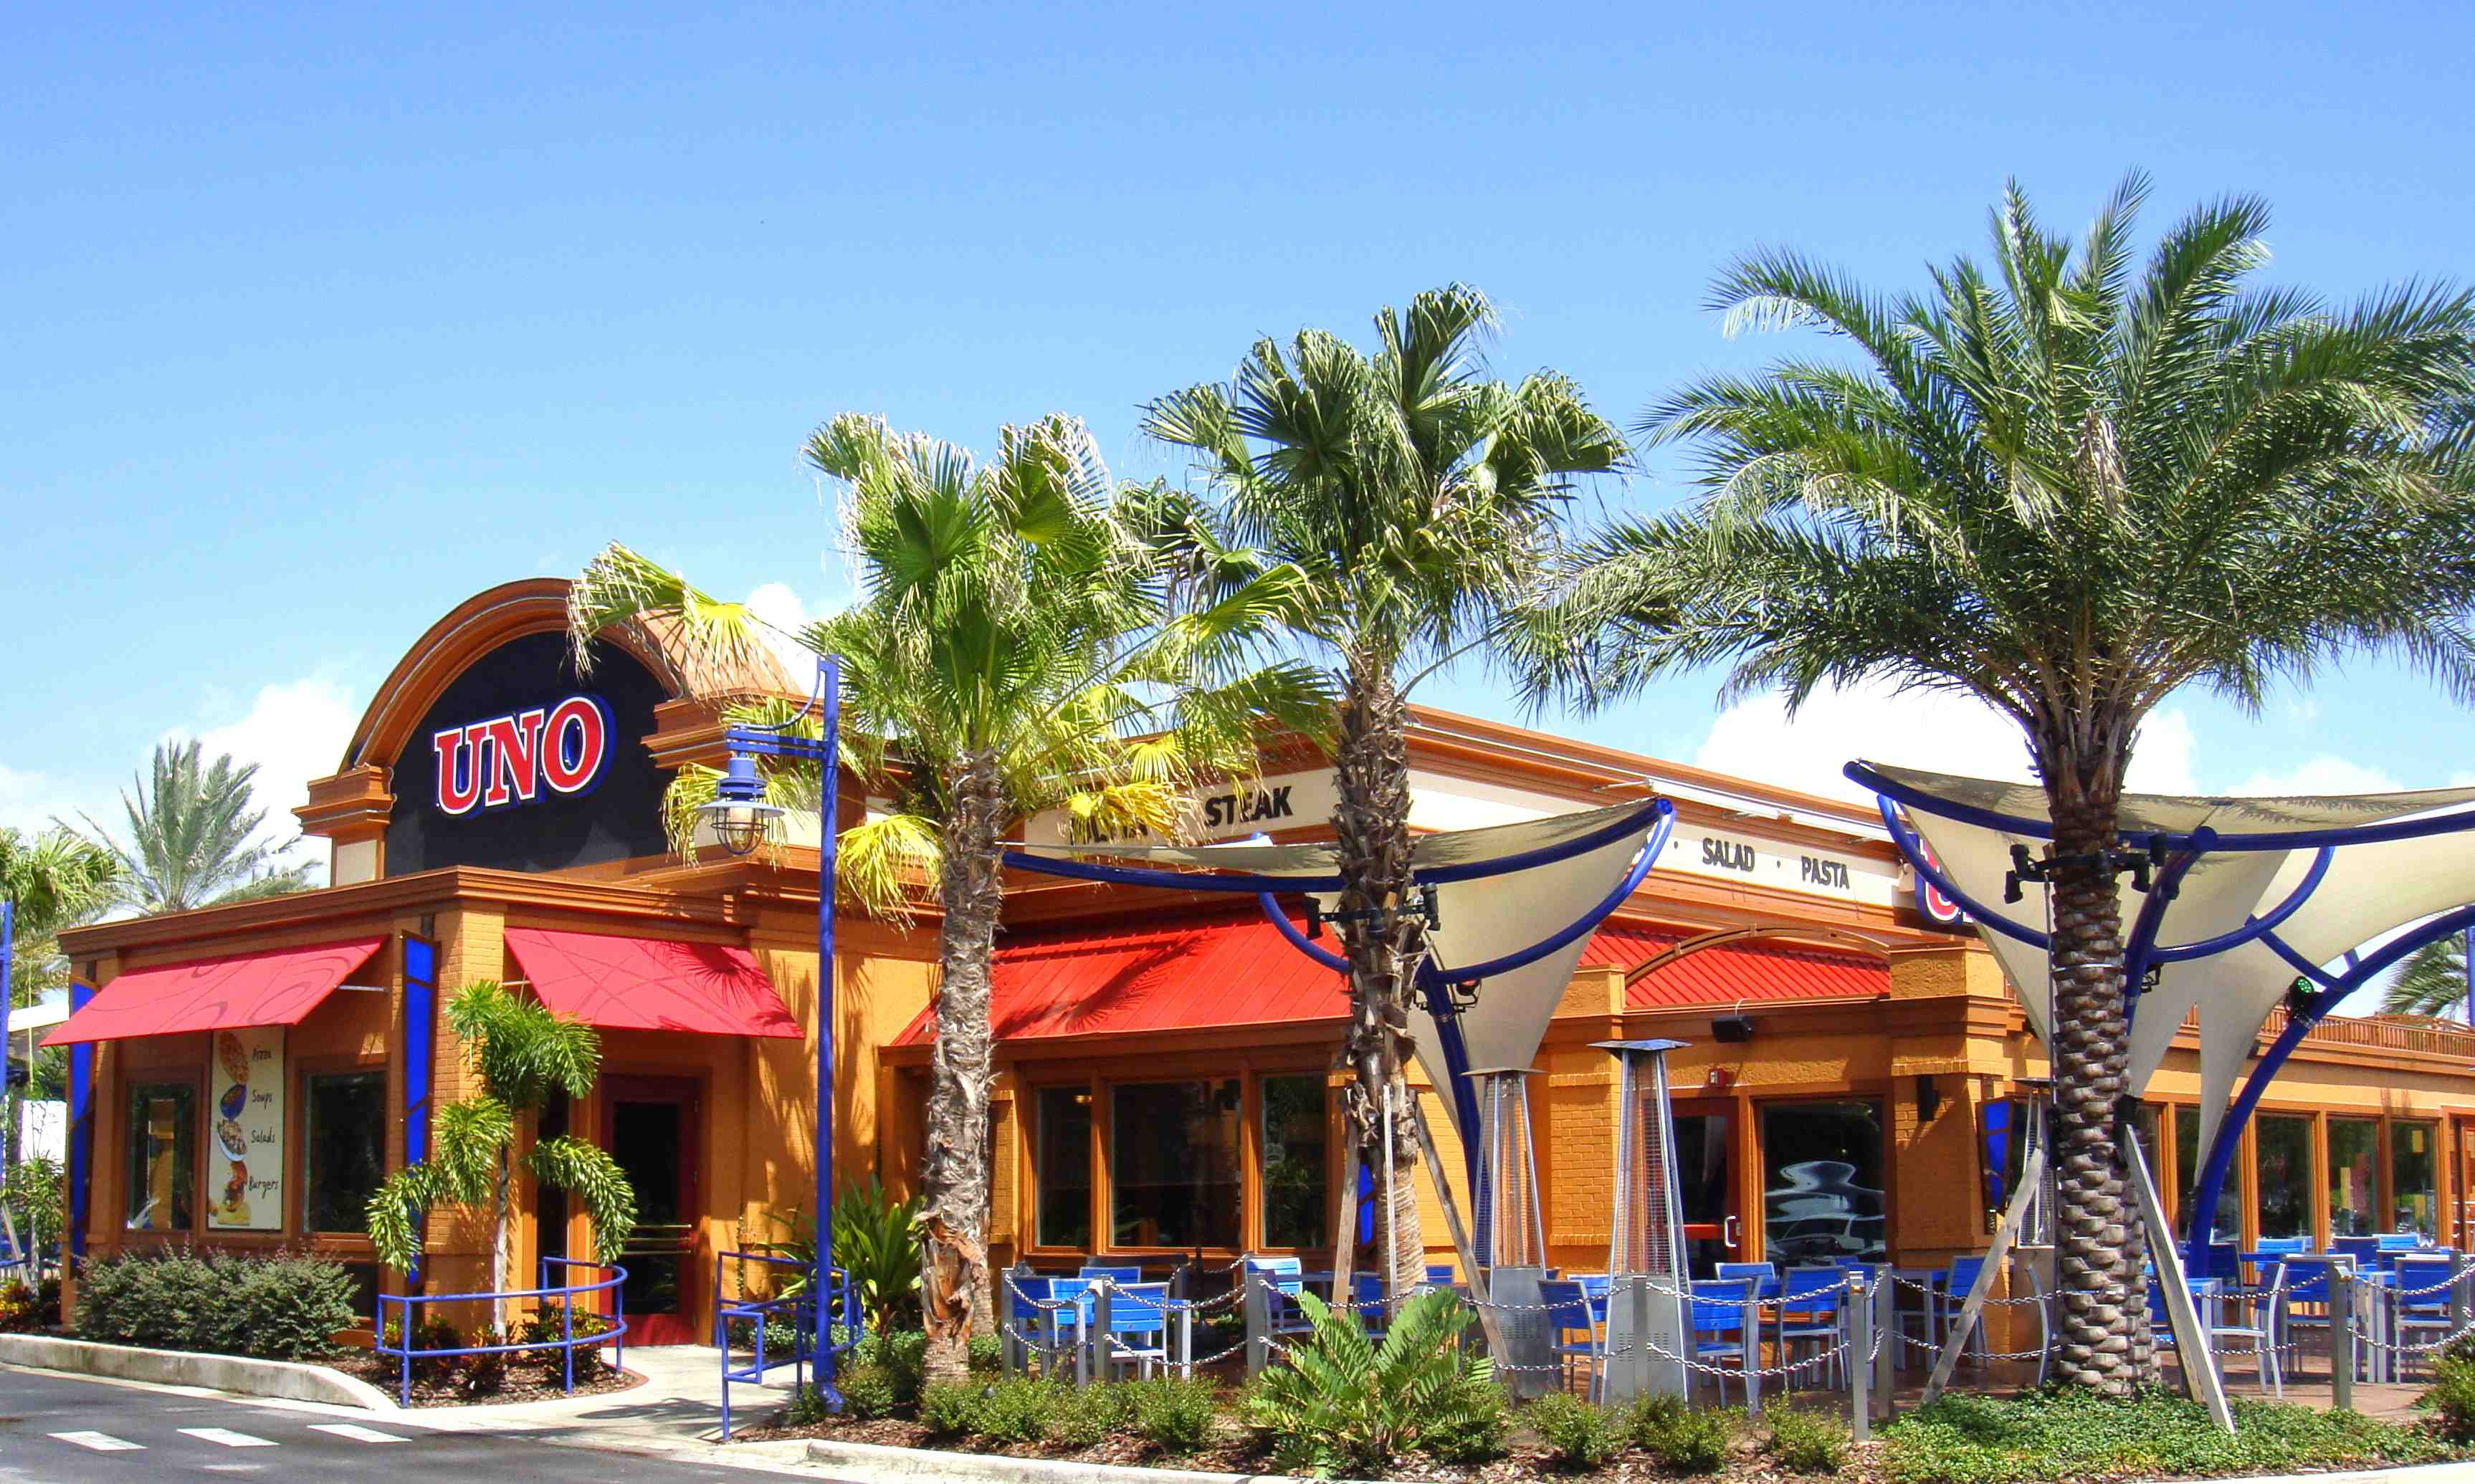 Uno Pizzeria & Grill - Home - Orlando, Florida - Menu ...